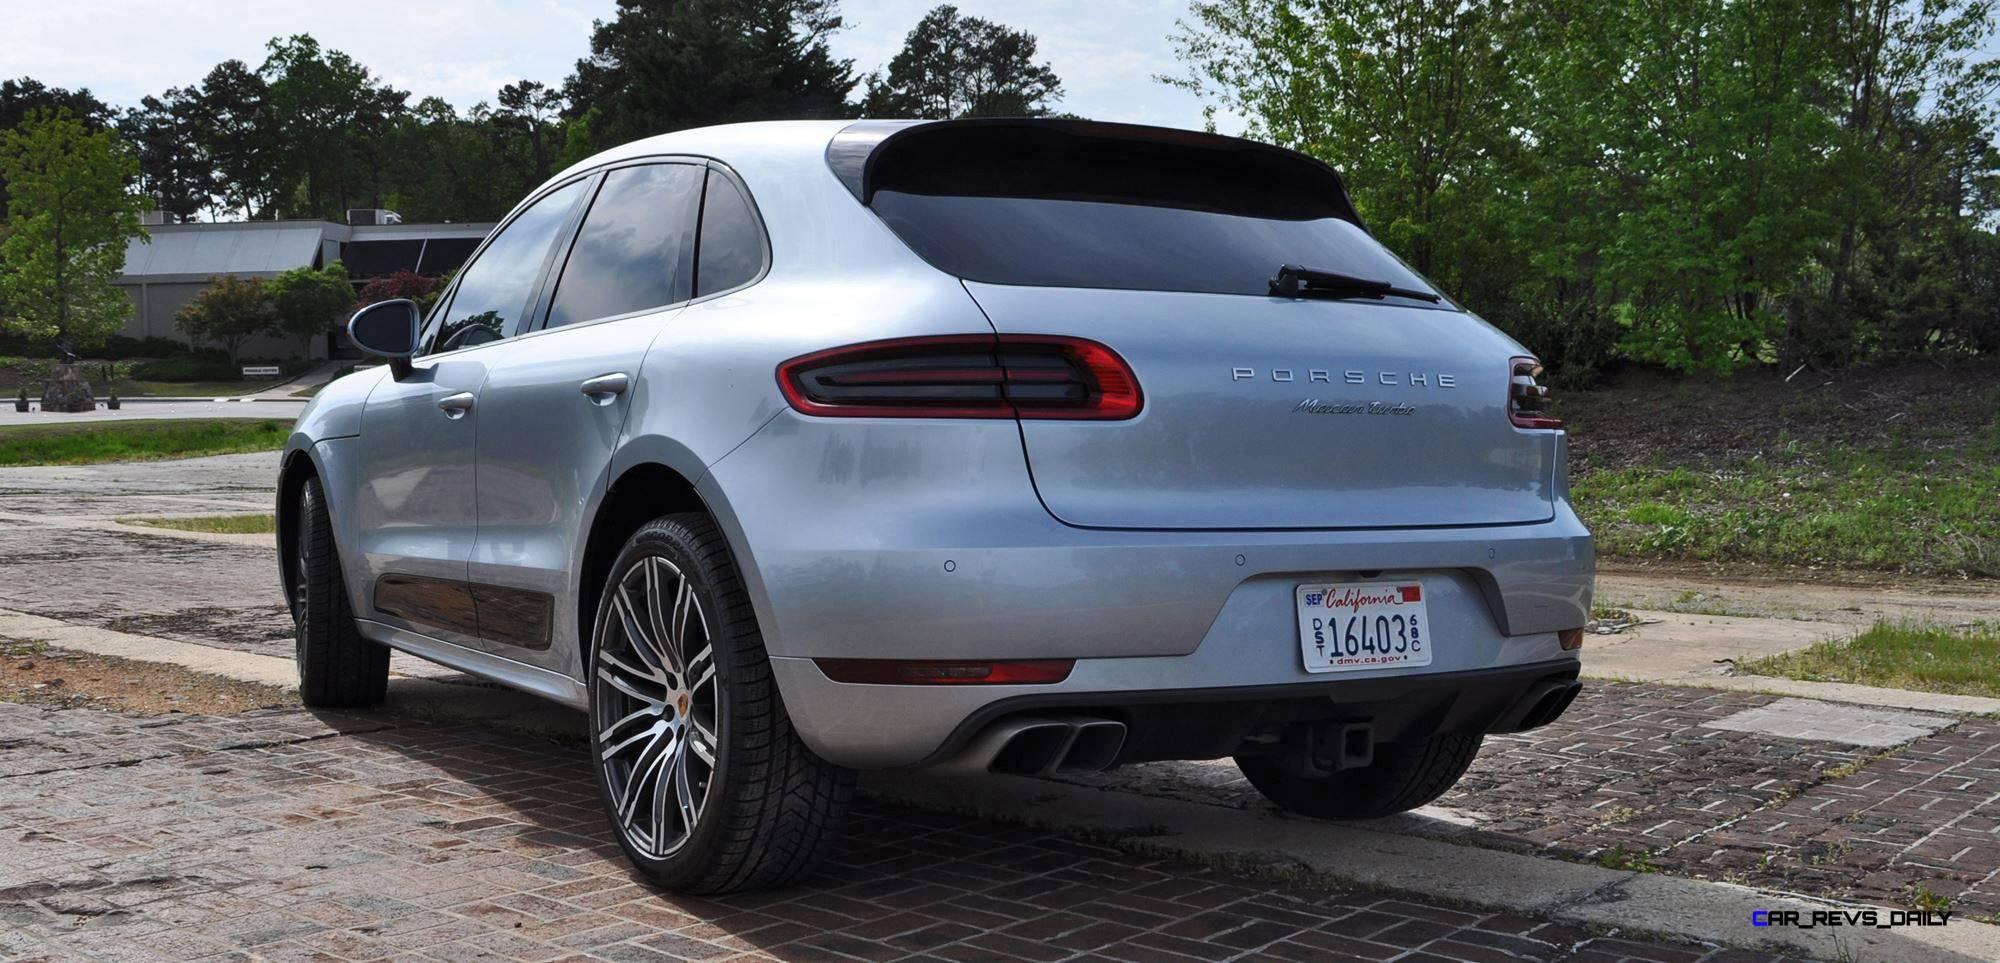 Model 2015 Porsche MACAN TURBO Review